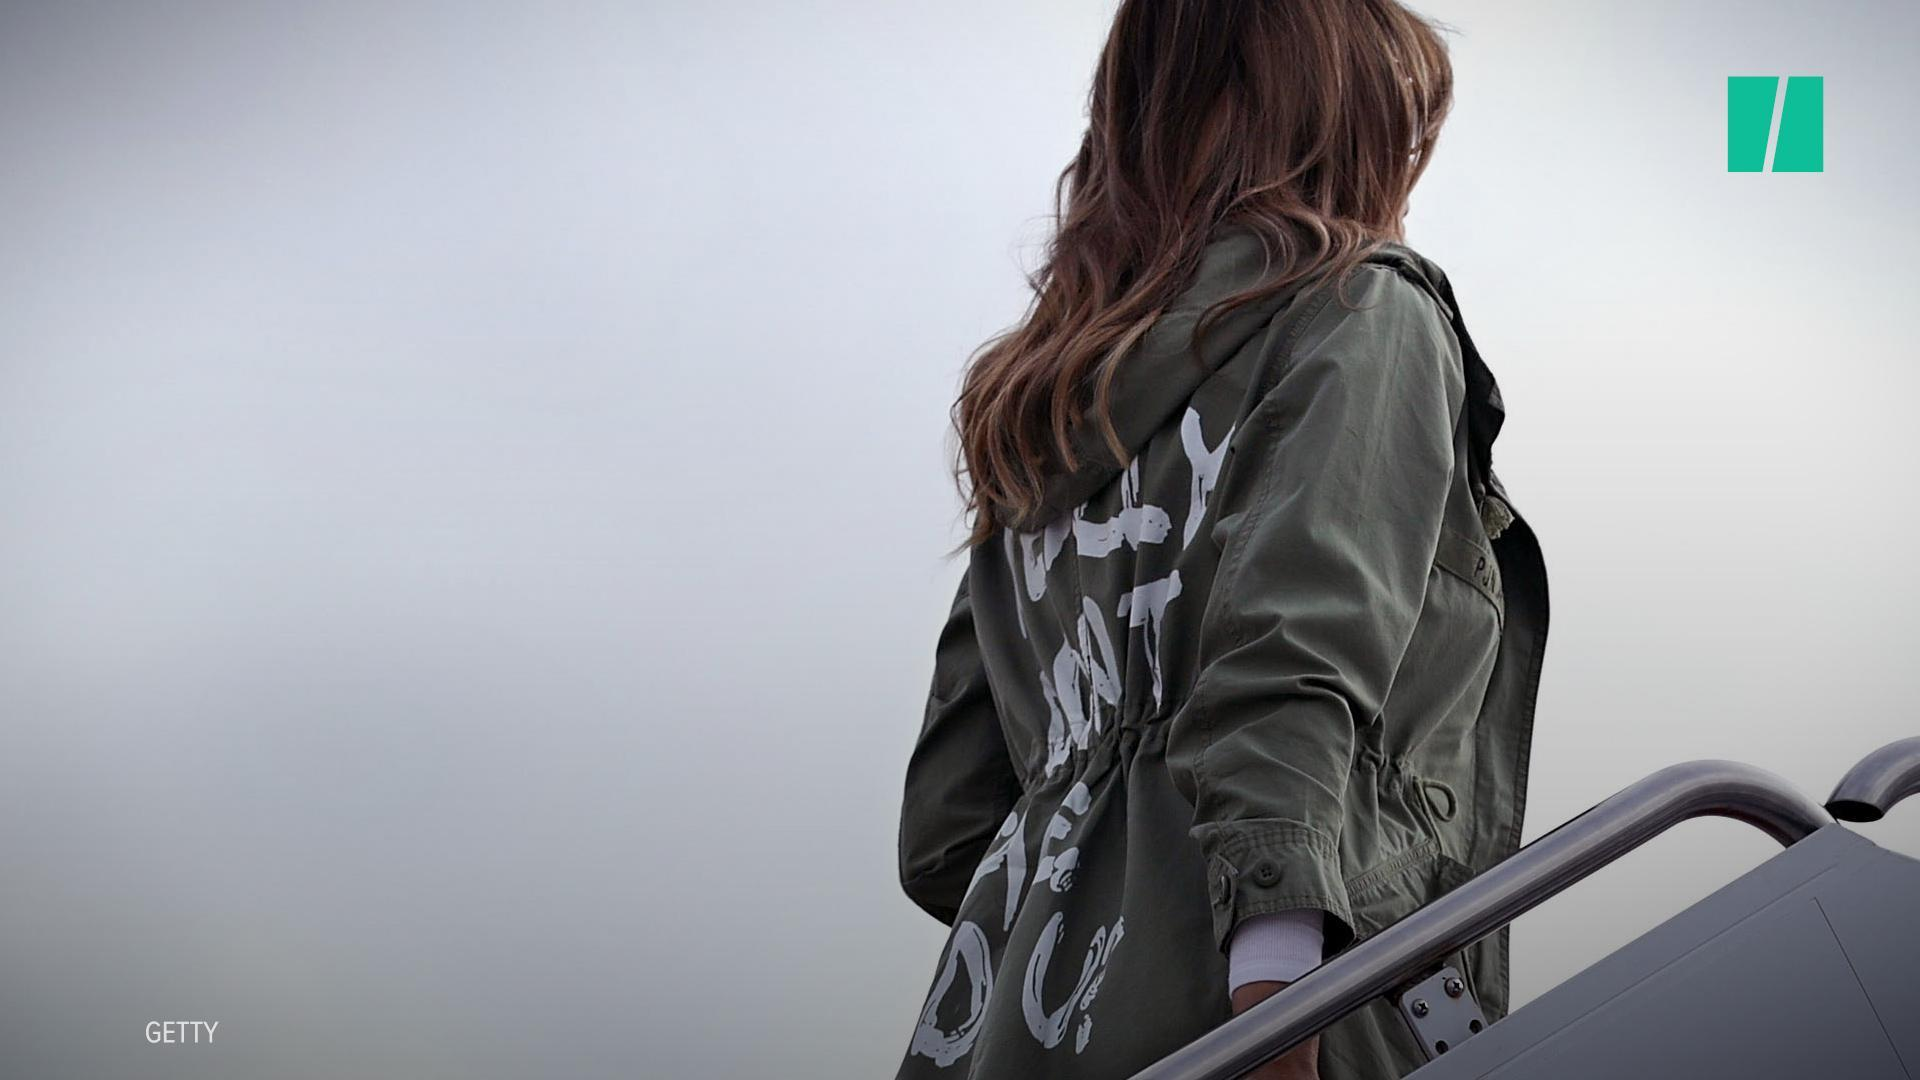 Melania Trump Reveals Why She Wore 'I Really Don't Care' Jacket